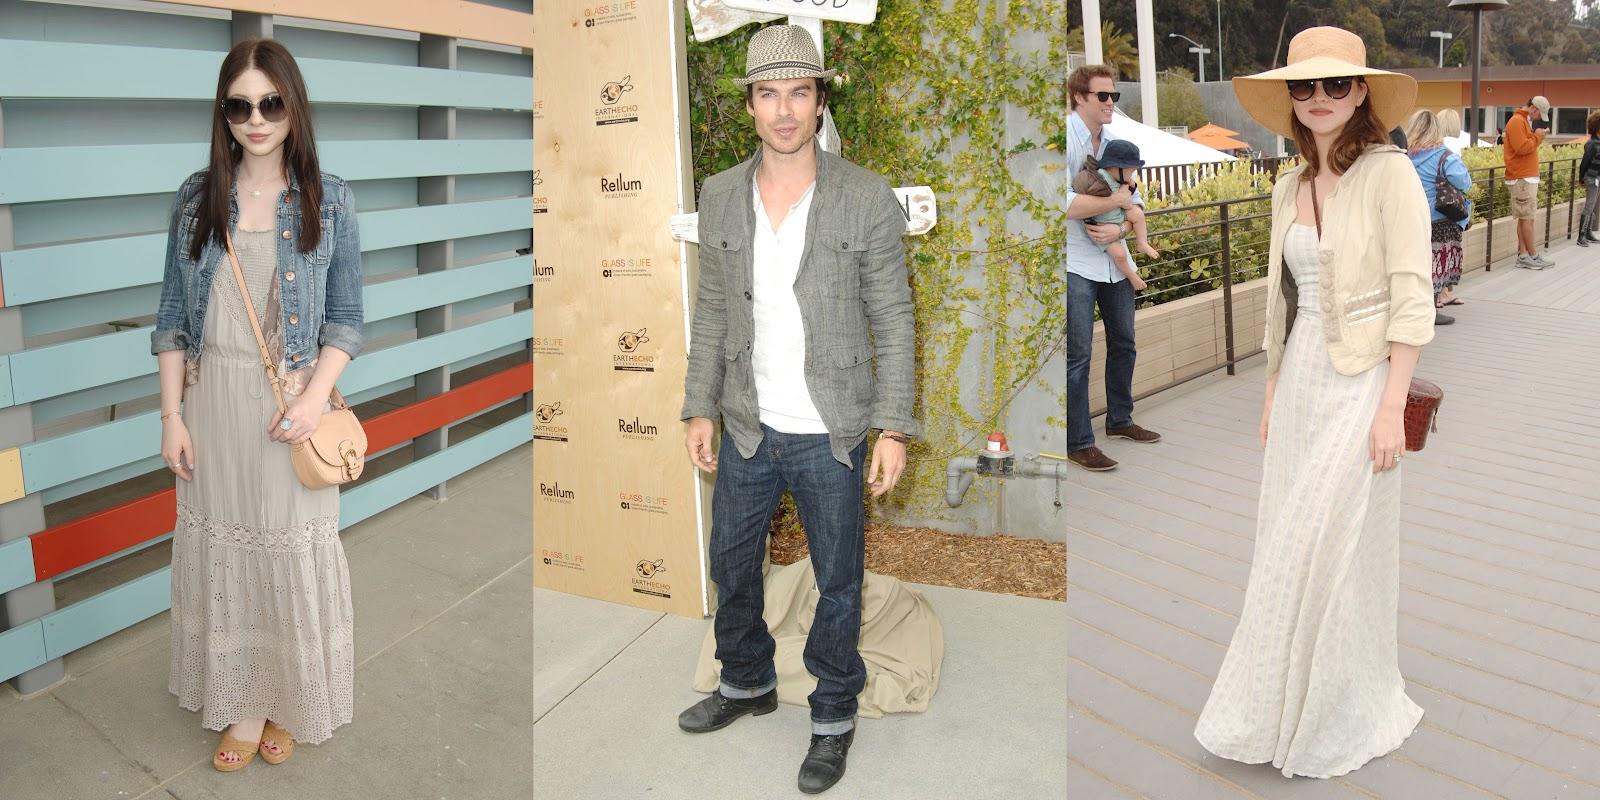 http://1.bp.blogspot.com/-hFaZqyDGosQ/T5b2J2mBxII/AAAAAAAAEeI/I72d-X_0NVs/s1600/Earth+Day+fashion+.jpg